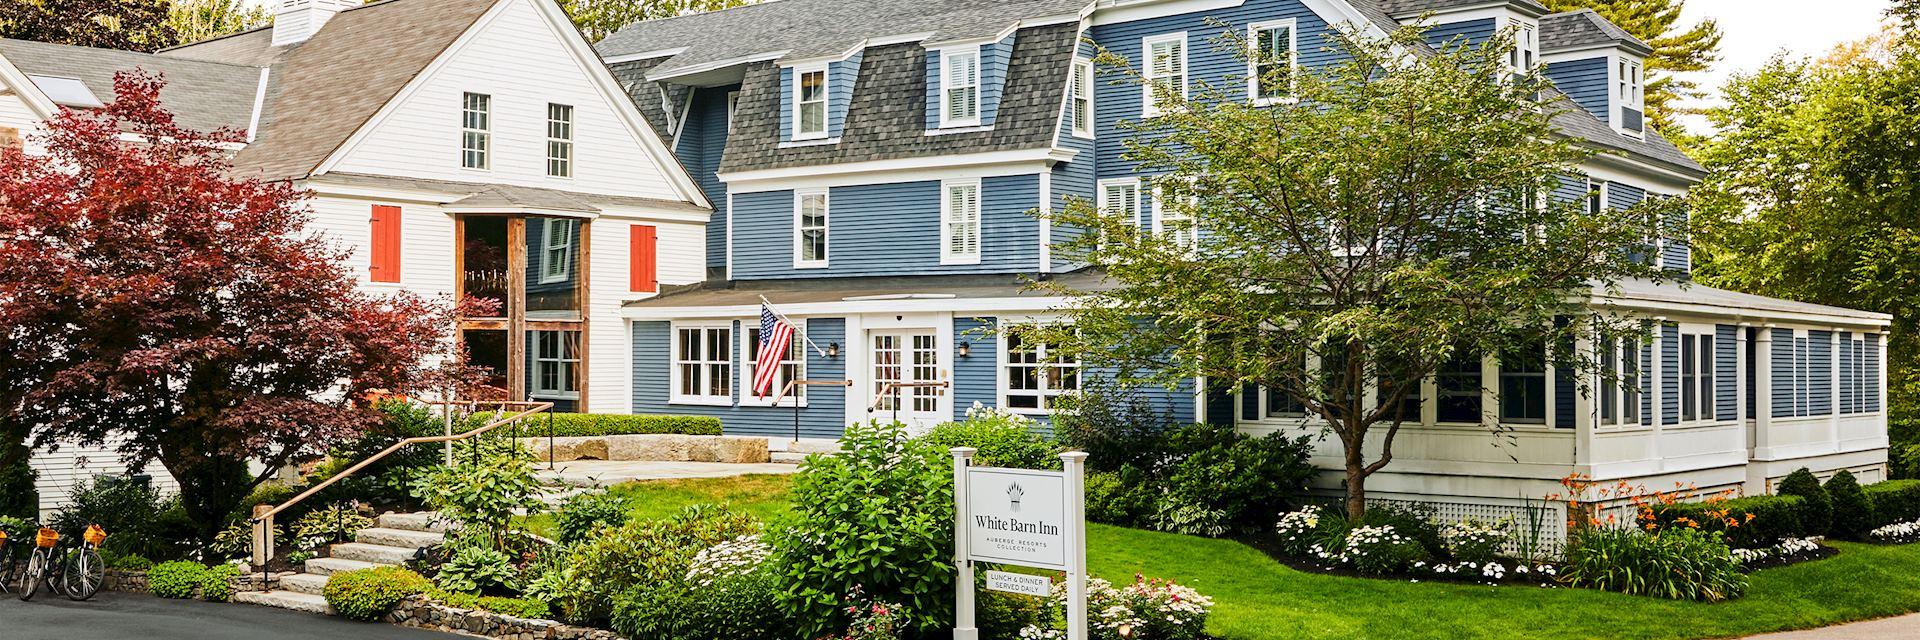 White Barn Inn, Auberge Resorts Collection